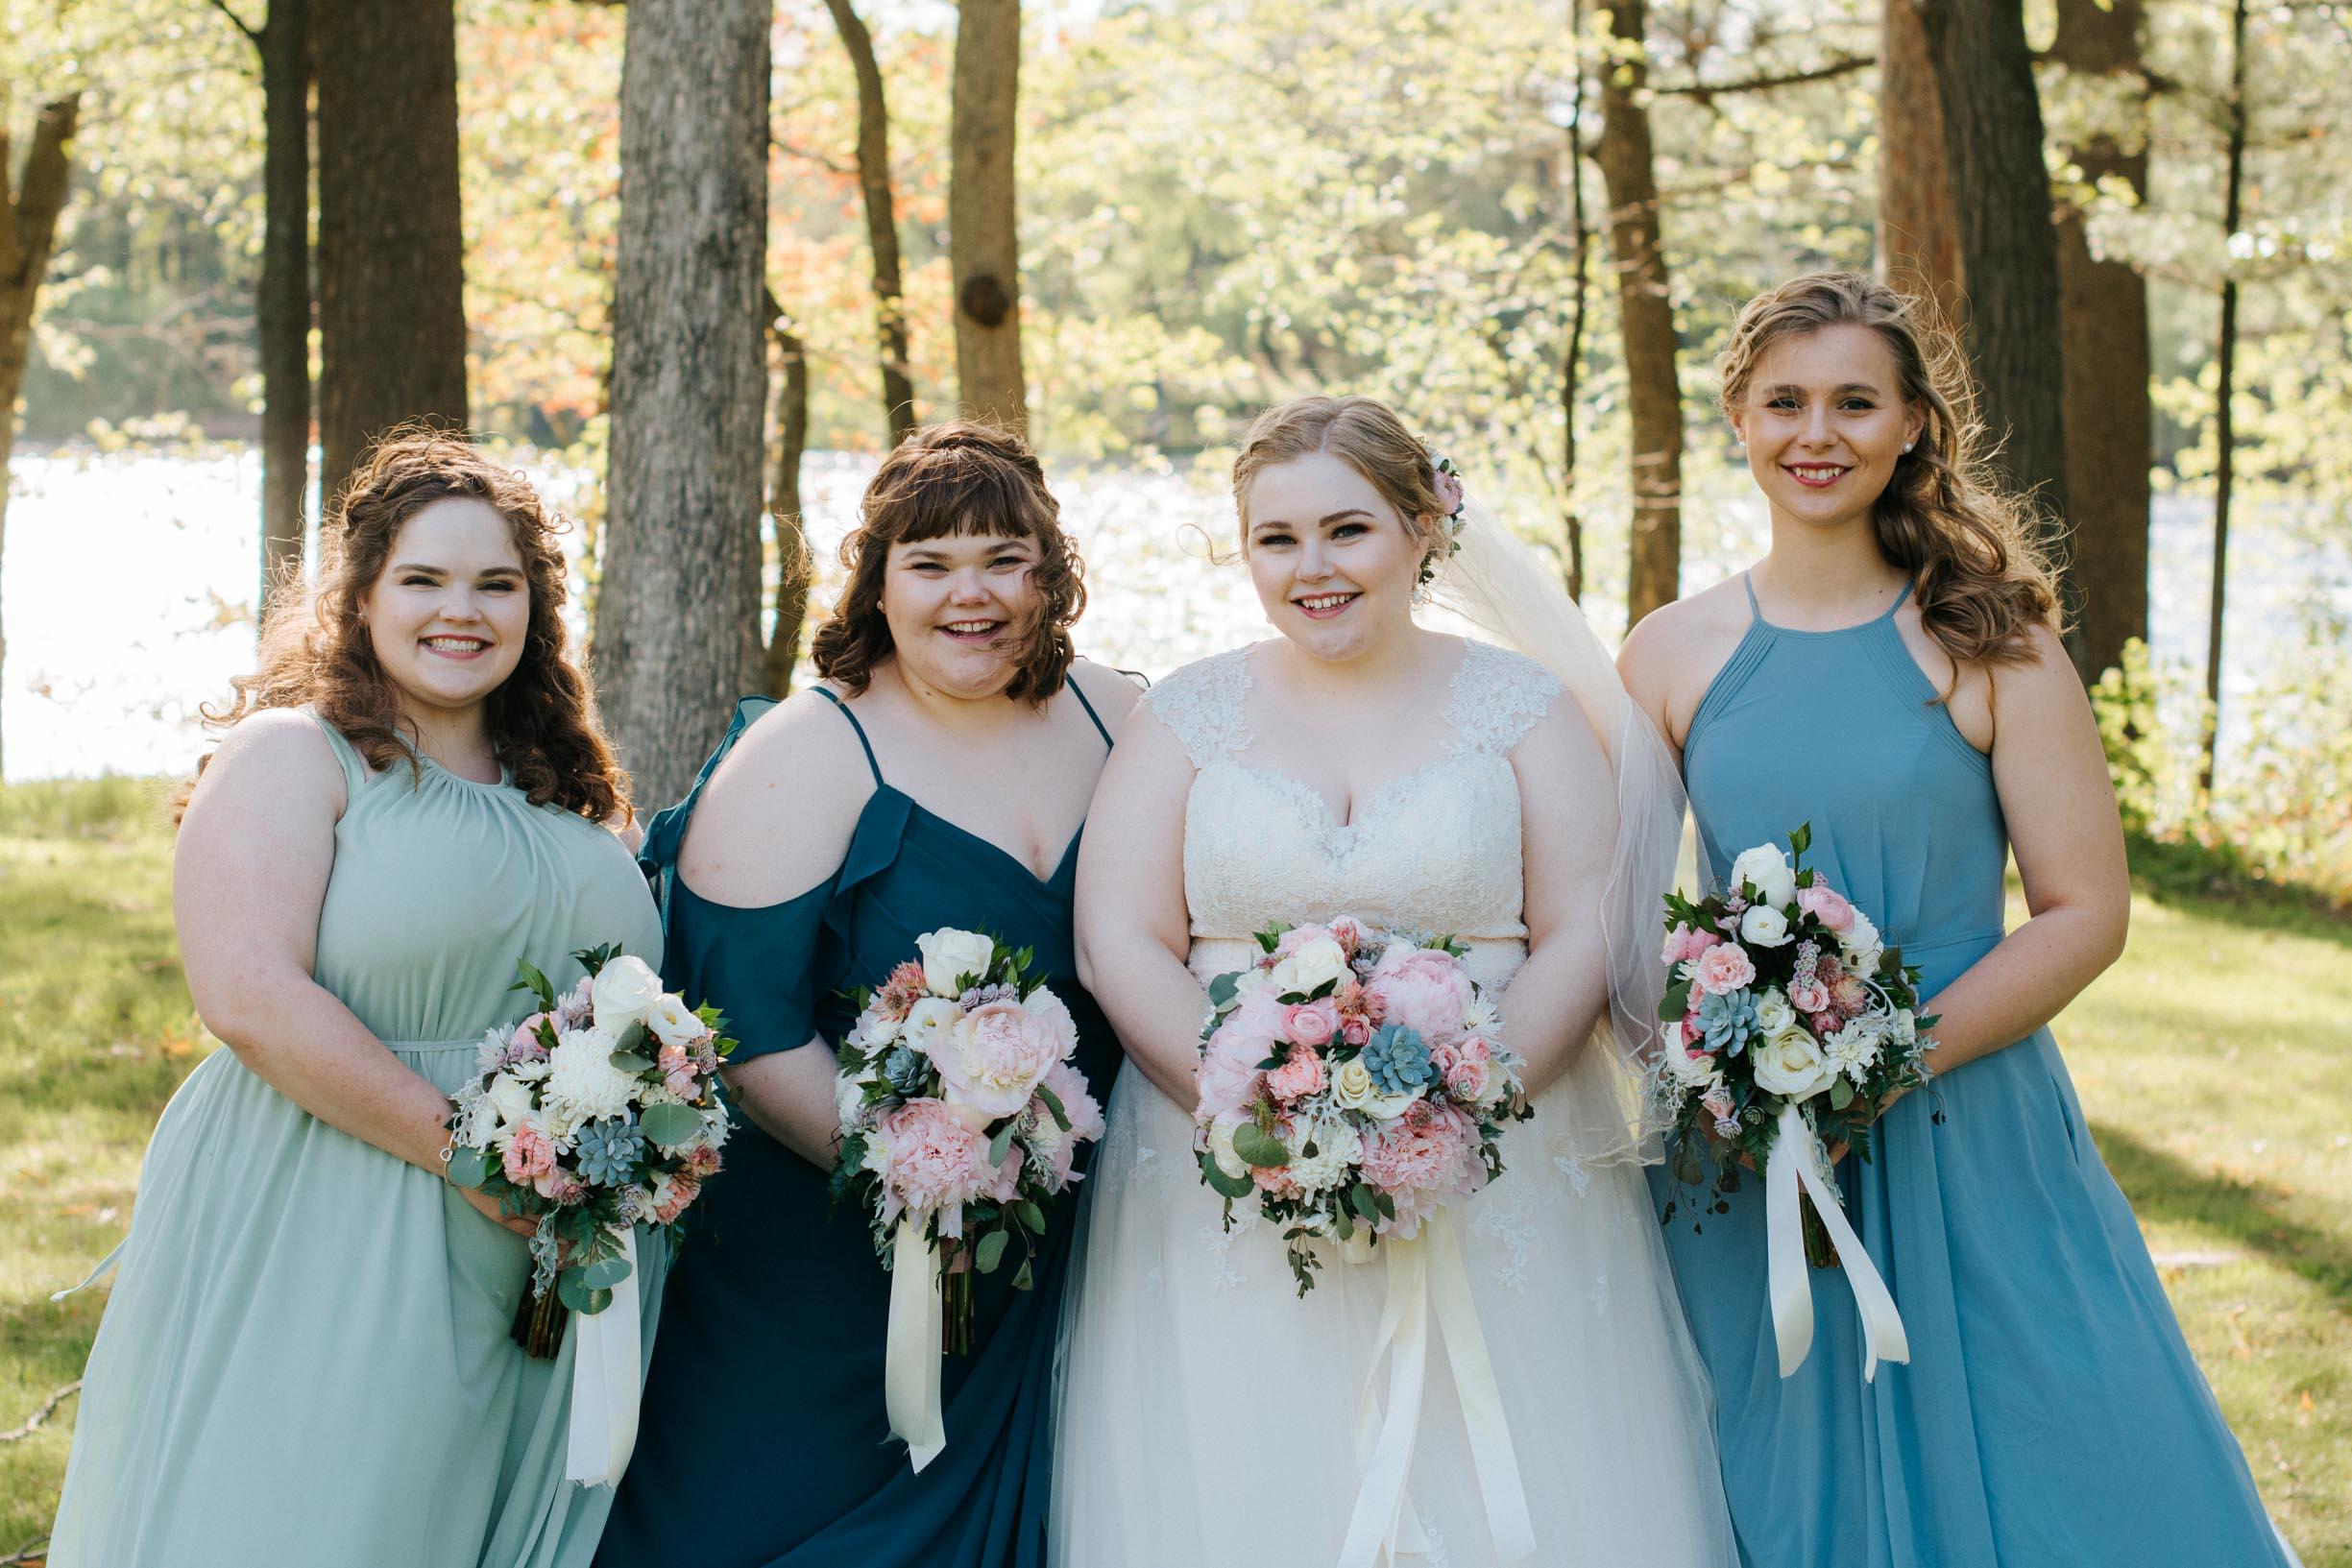 Hannah_Brandon_Wisconsin_Wedding_Party_Portraits-32.jpg